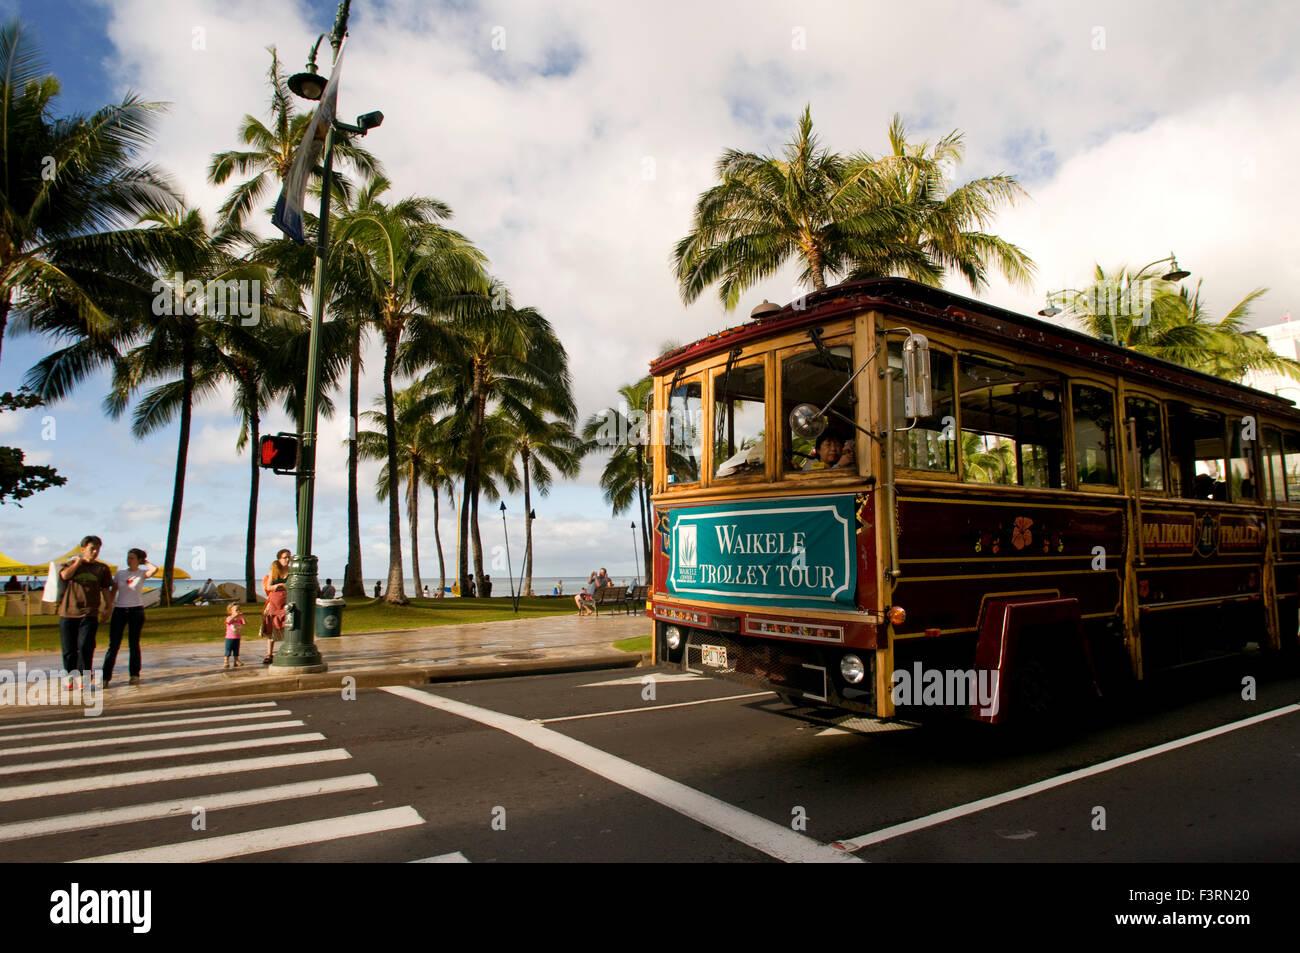 Waikiki Trolly, tourist bus shopping that runs between Waikiki and Honolulu. O'ahu. Waikiki Trolley Trolley - Stock Image